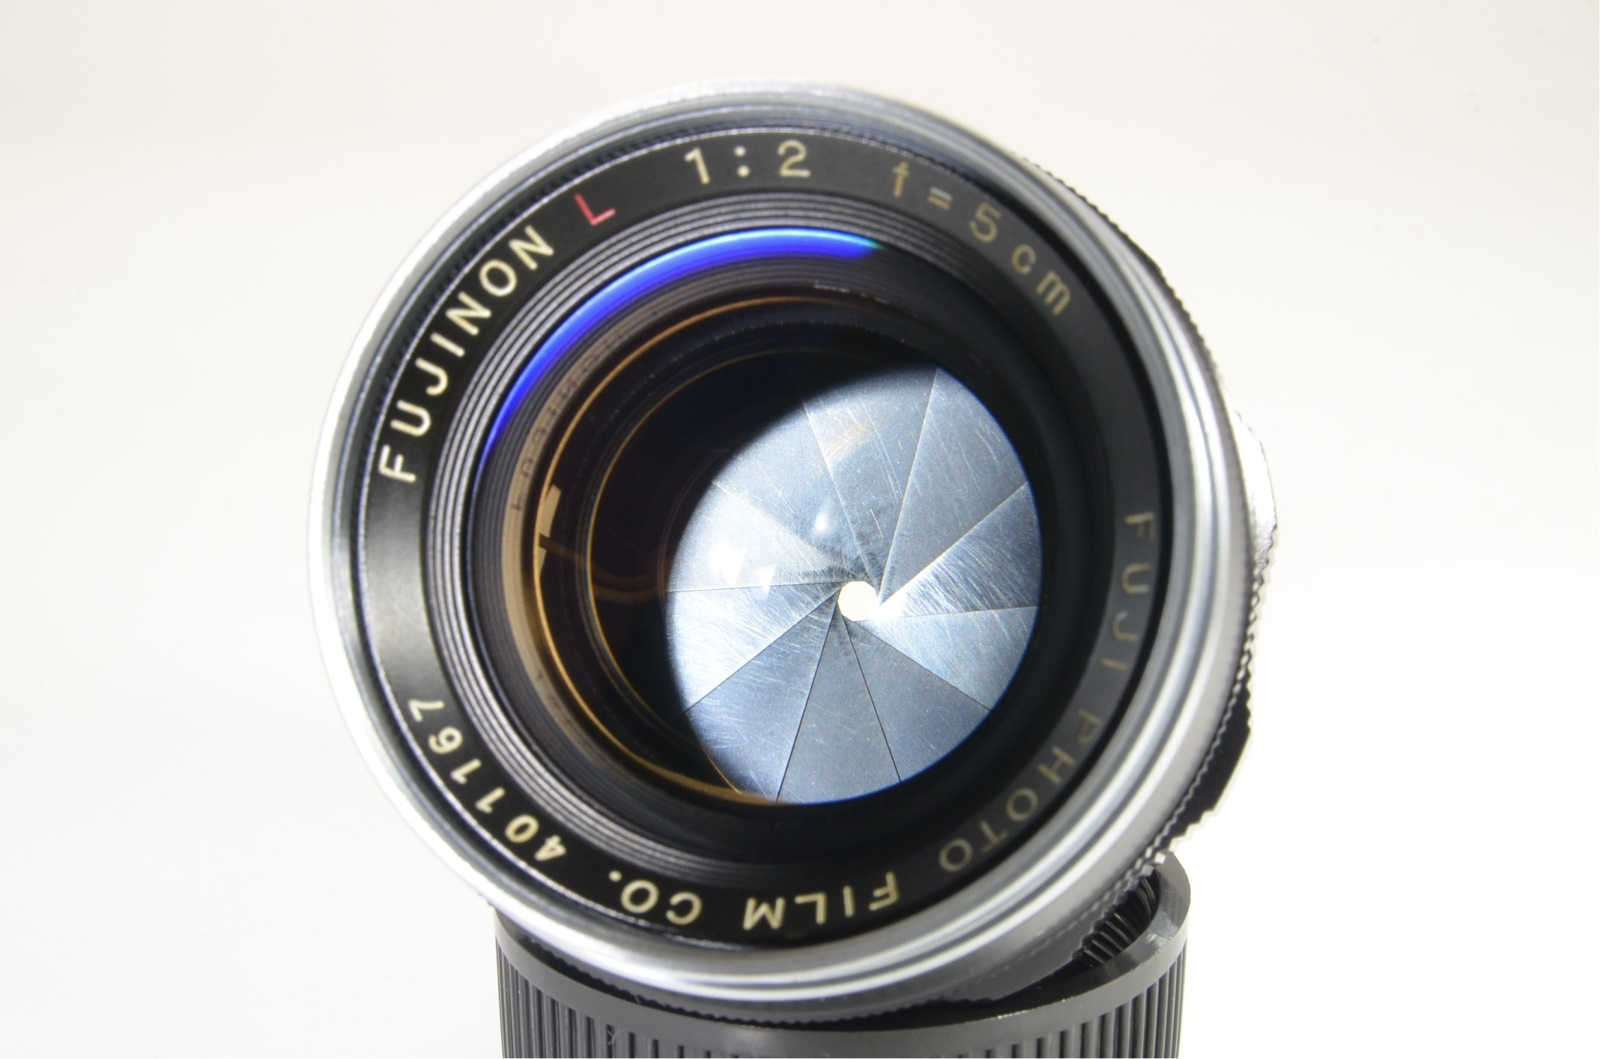 fujifilm fuji photo fujinon 50mm 5cm f2 leica l39 screw mount shooting tested